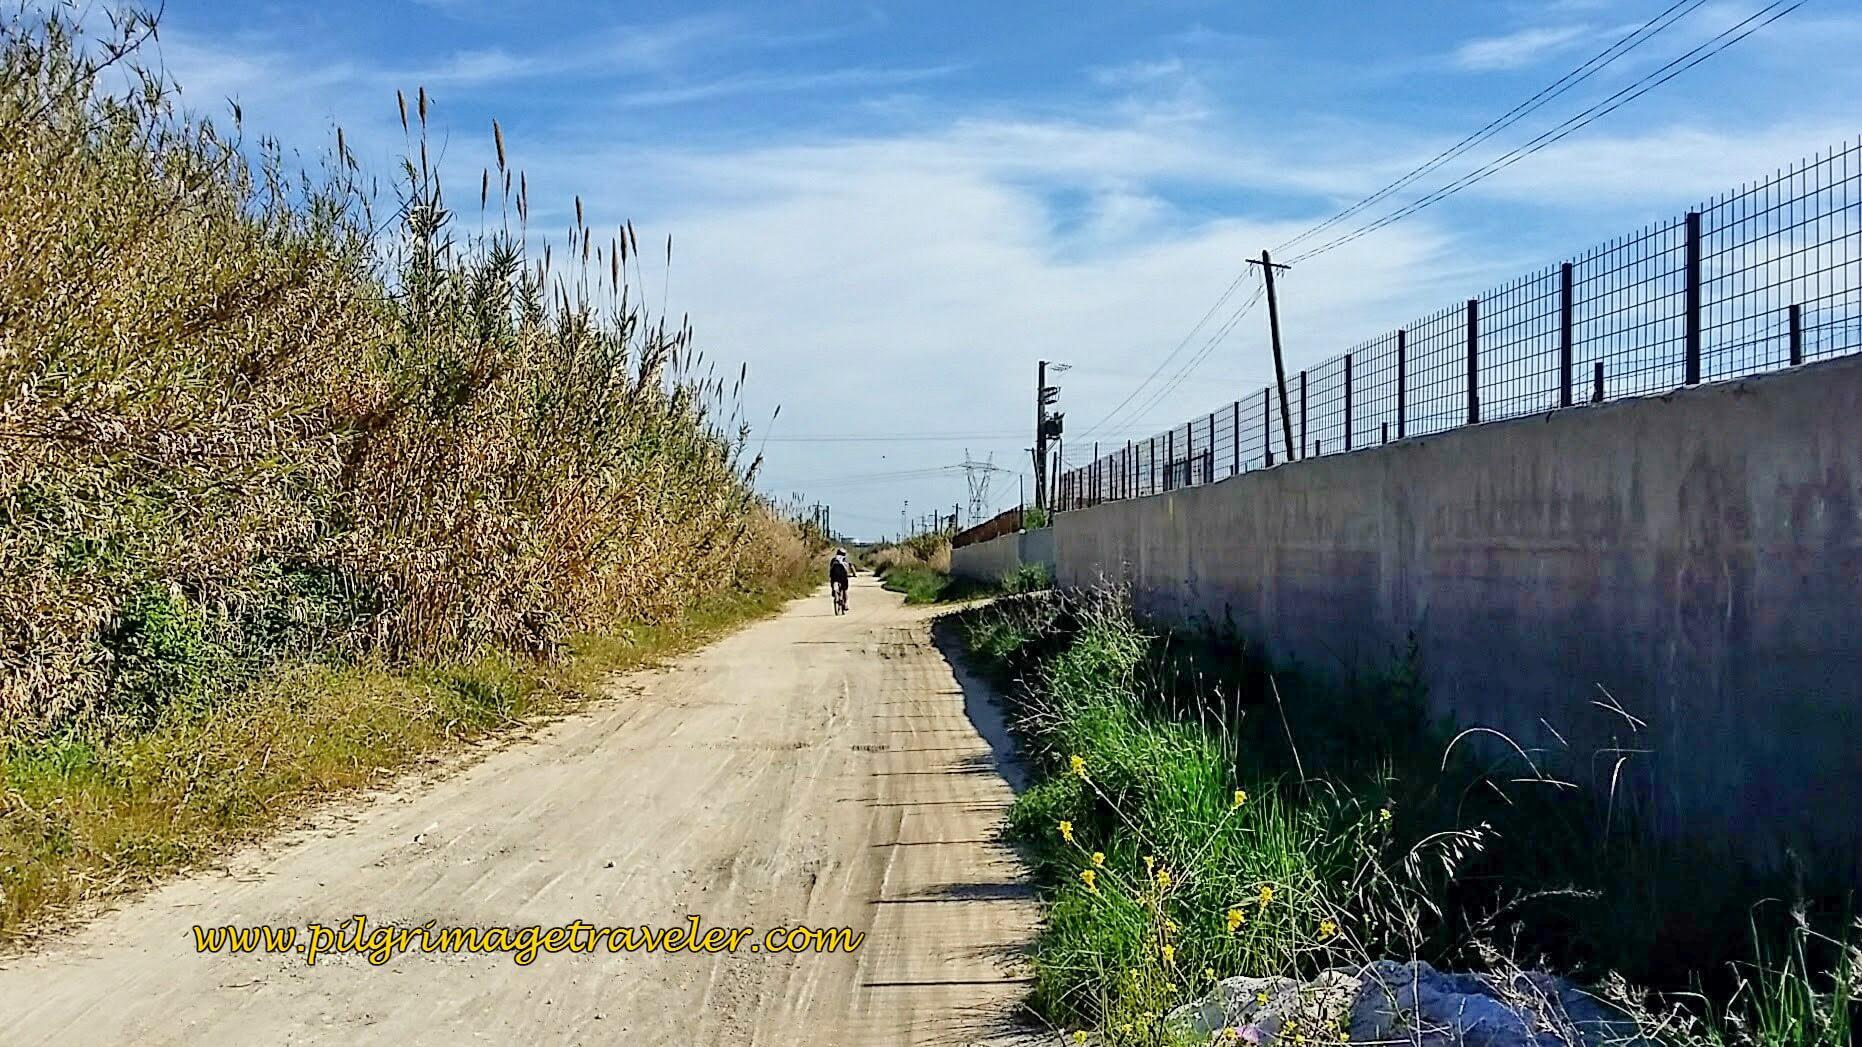 Lane Joins the Railroad Tracks, walking towards Castanheira do Ribatejo